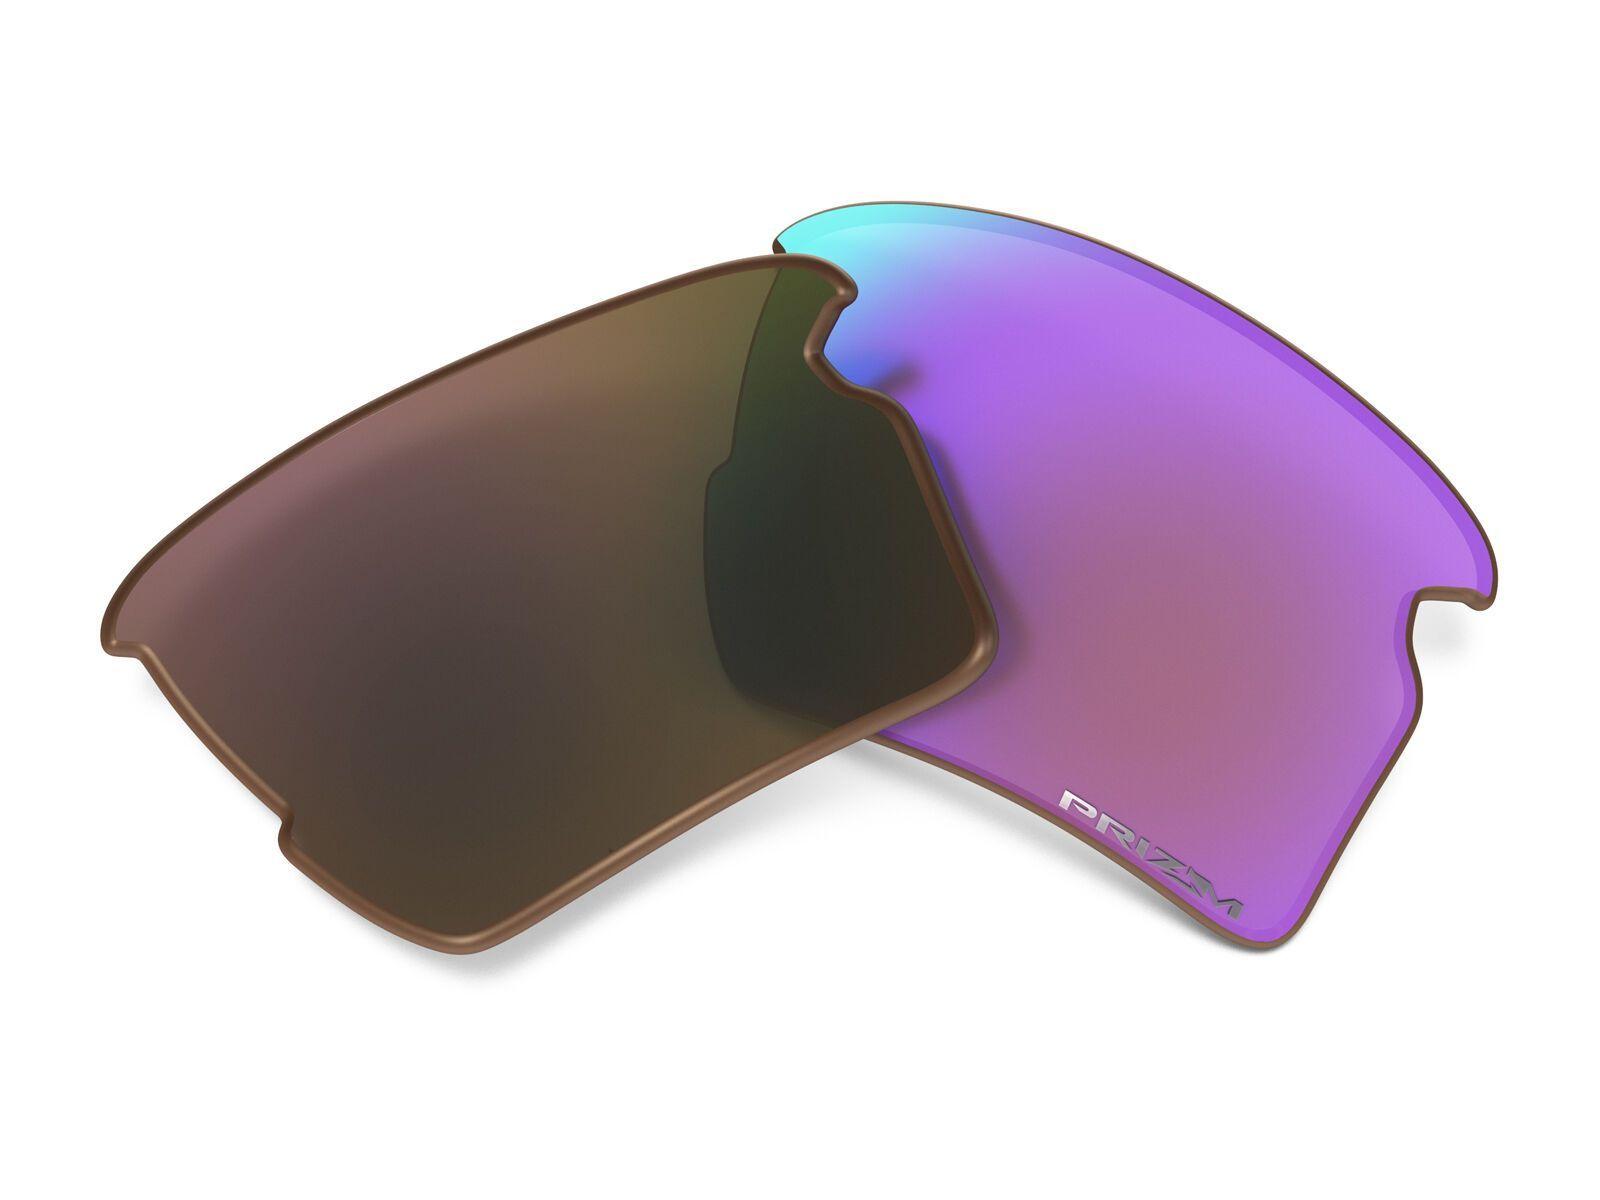 Oakley Flak 2.0 XL Wechselgläser, prizm golf | Bild 2